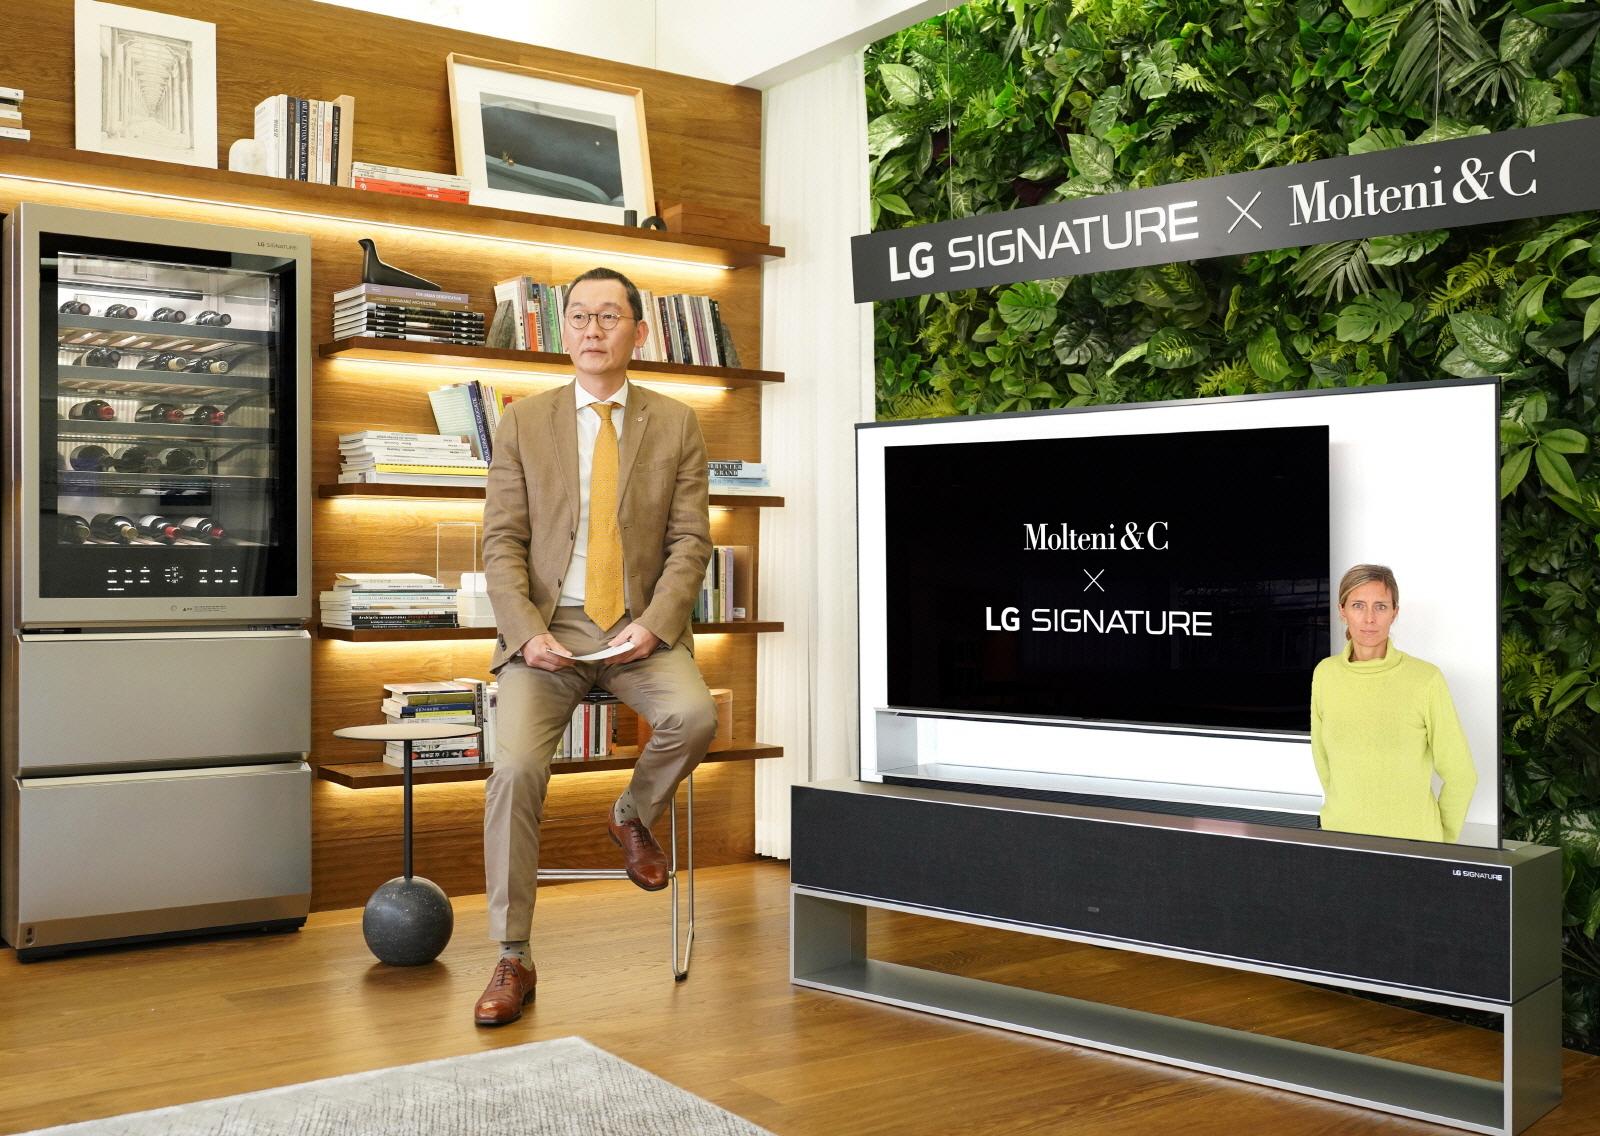 LG 시그니처, 이탈리아 명품 가구 브랜드와 전방위 협력